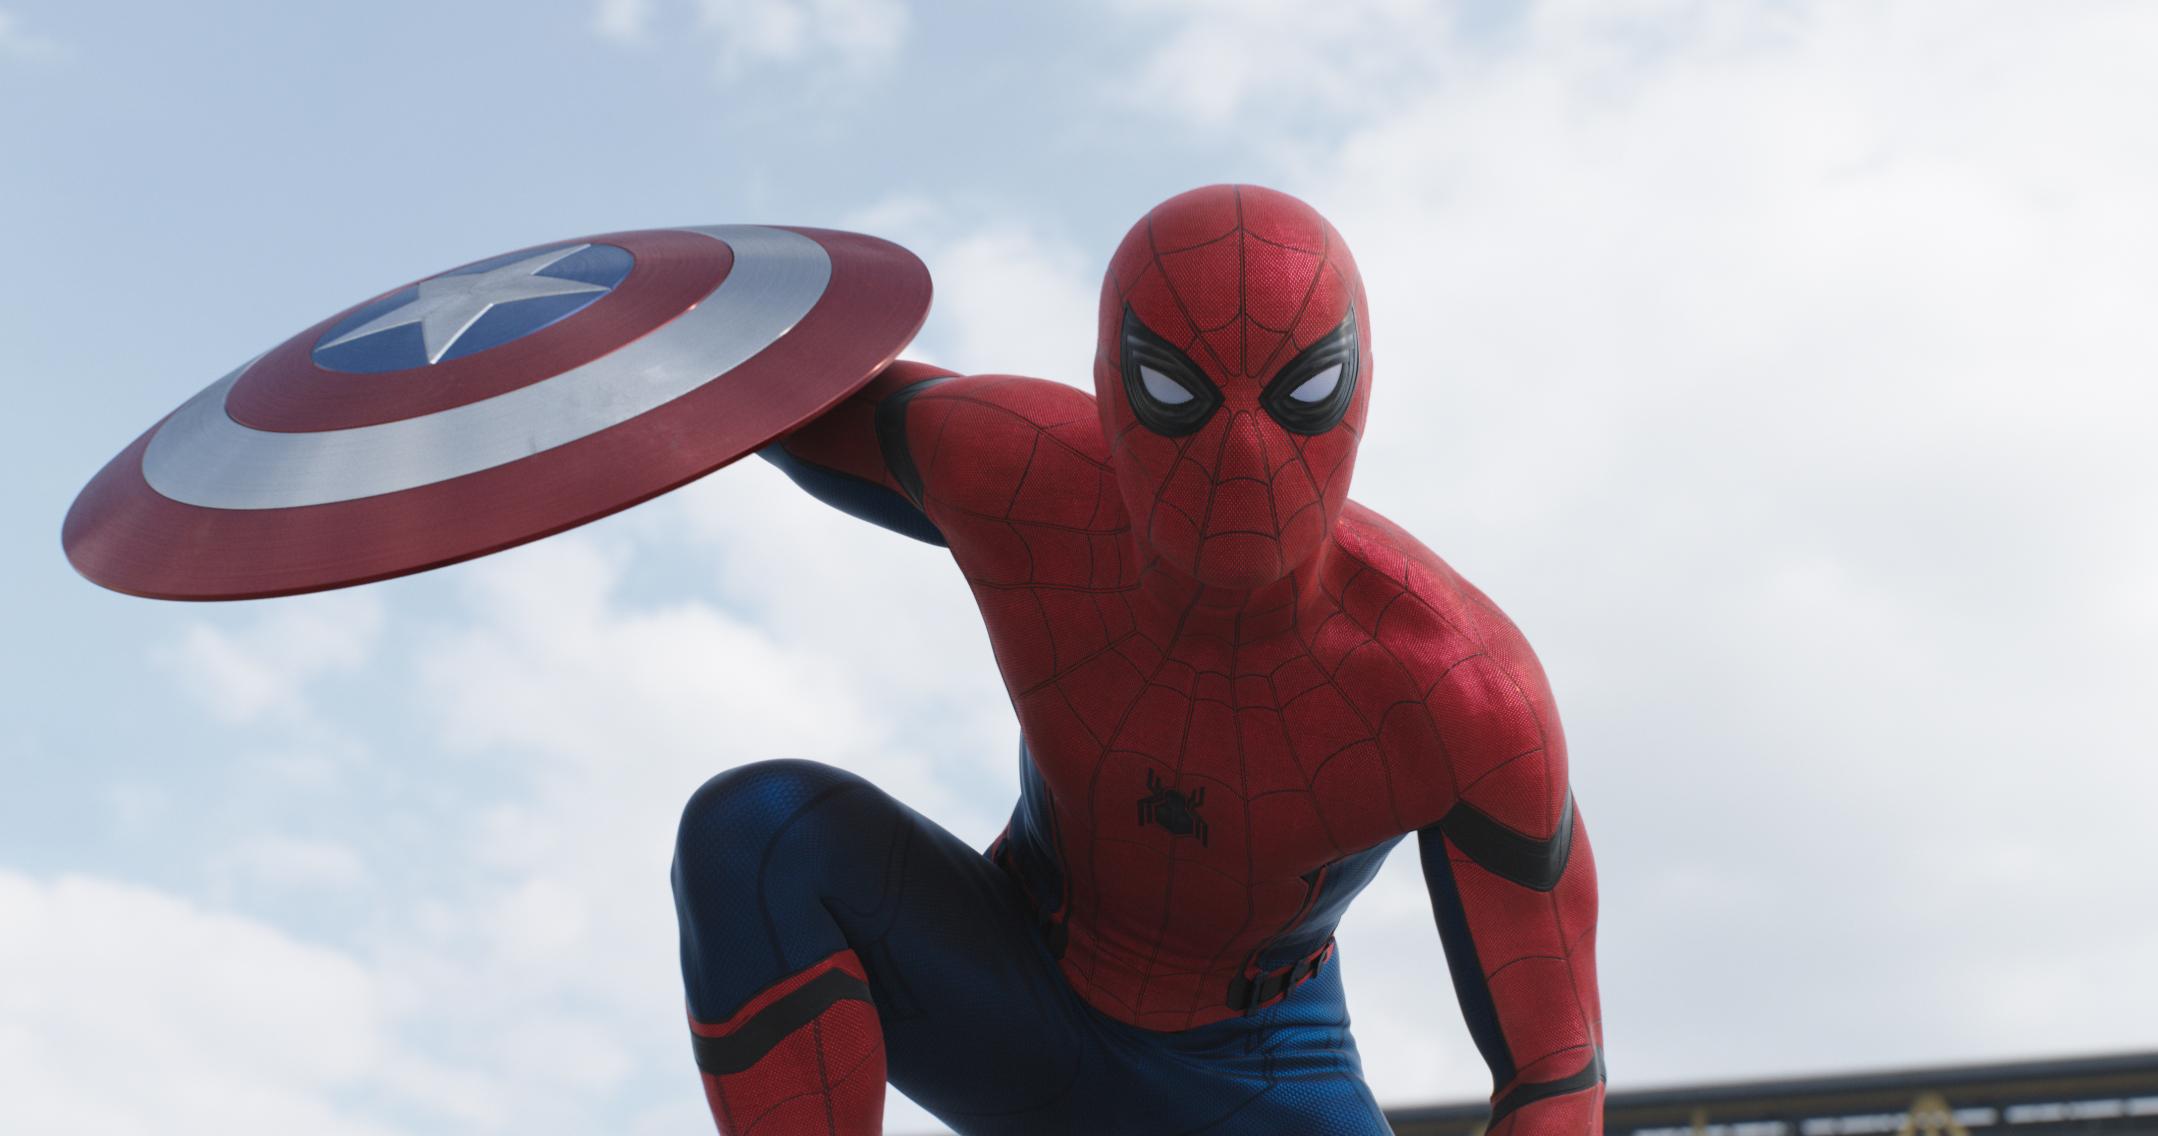 captain-america-civil-war-spider-man-image